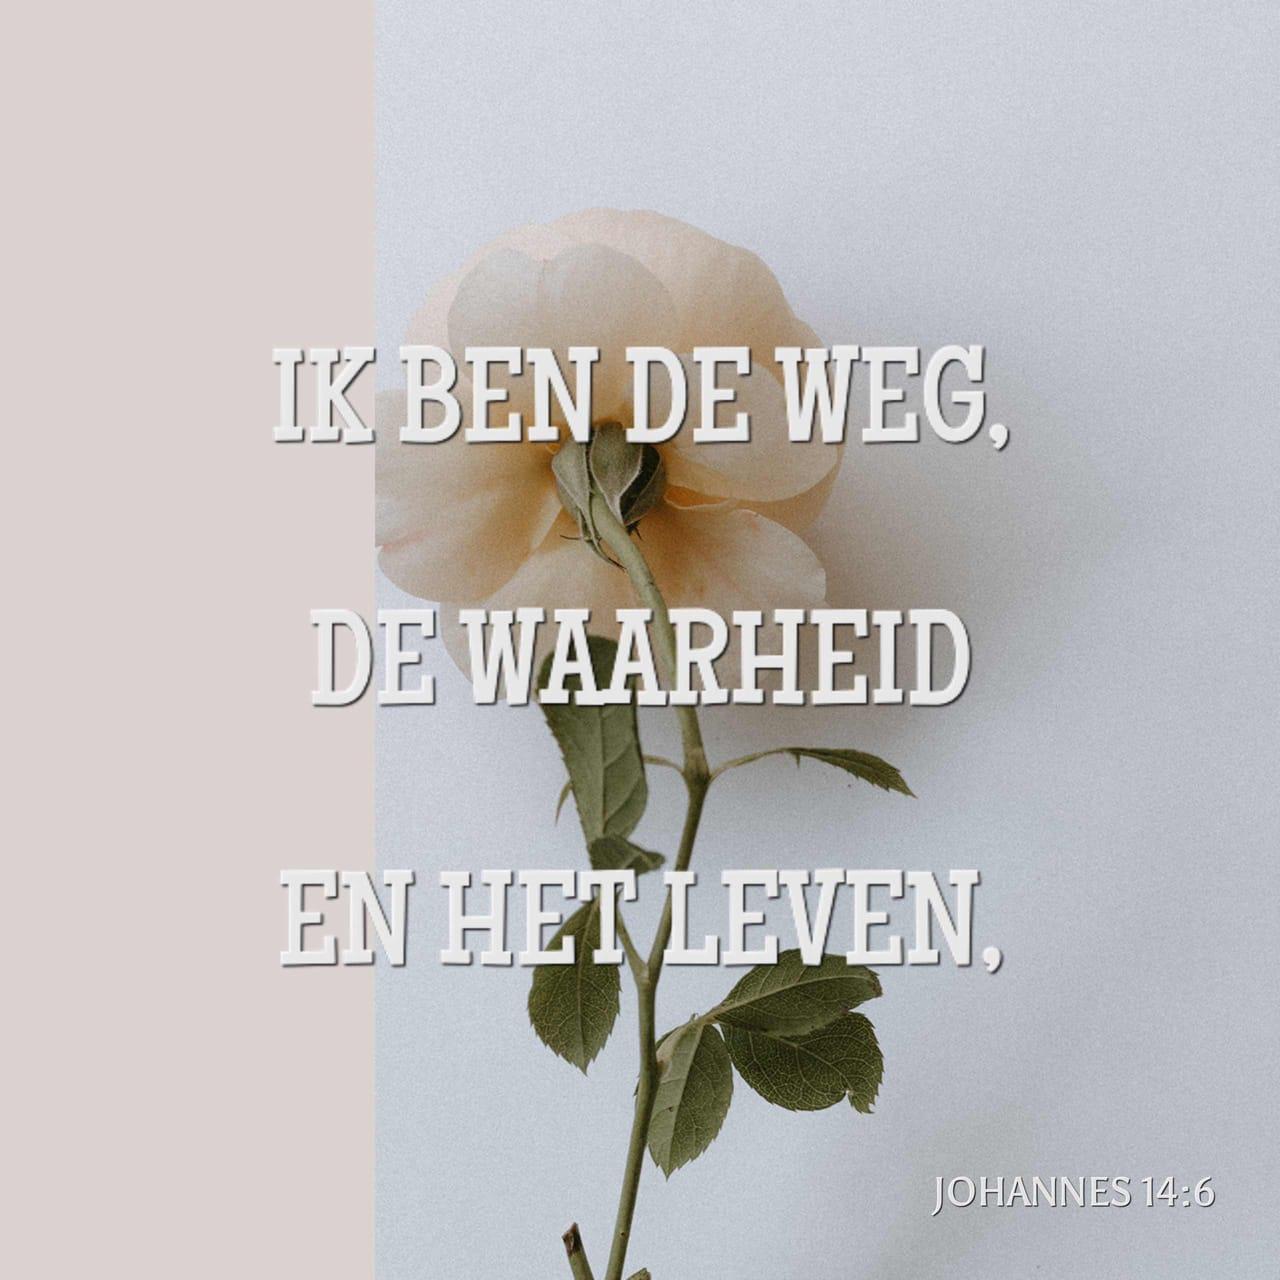 Johannes 14 1-6